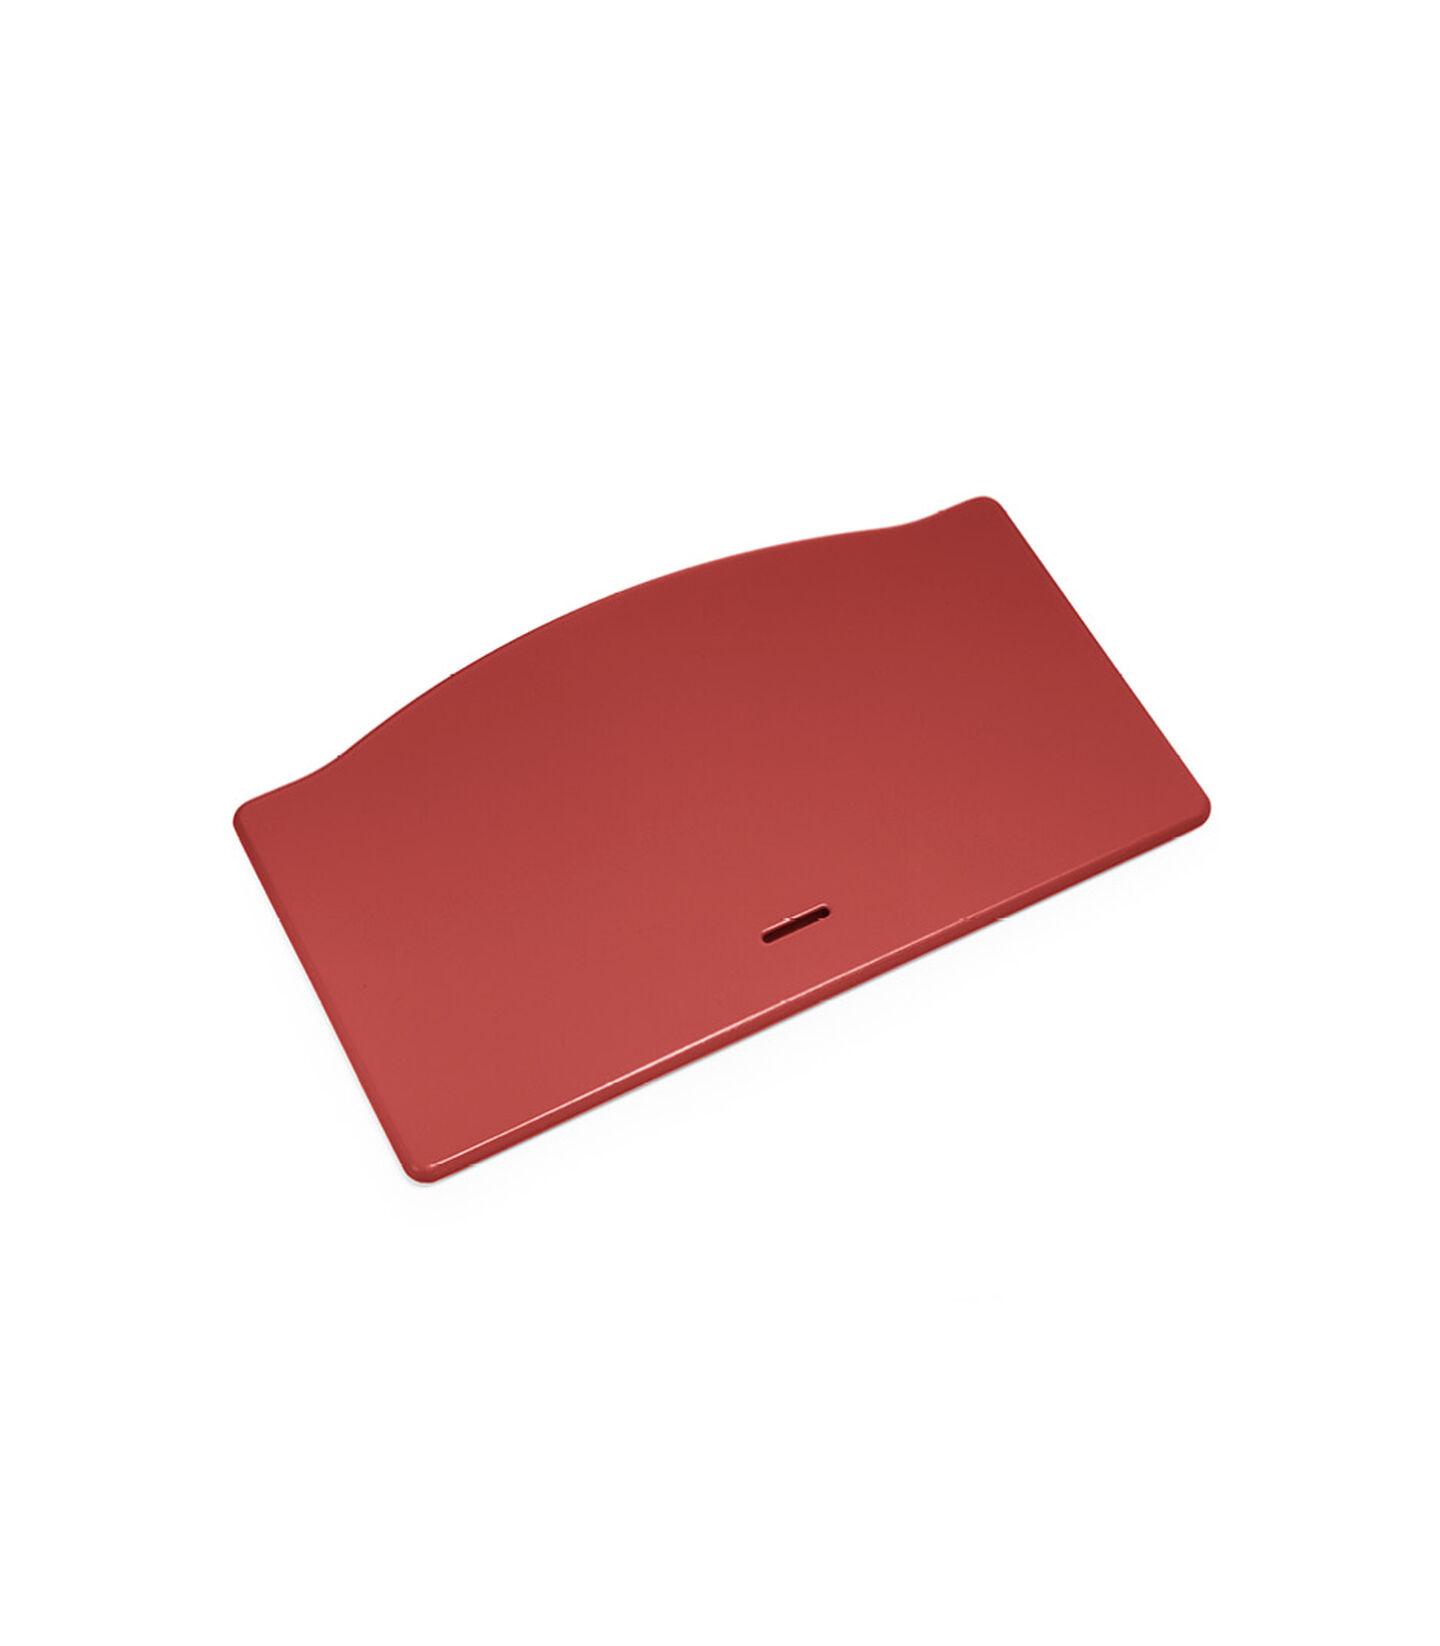 Tripp Trapp® Zitplank Warm rood, Warm rood, mainview view 1